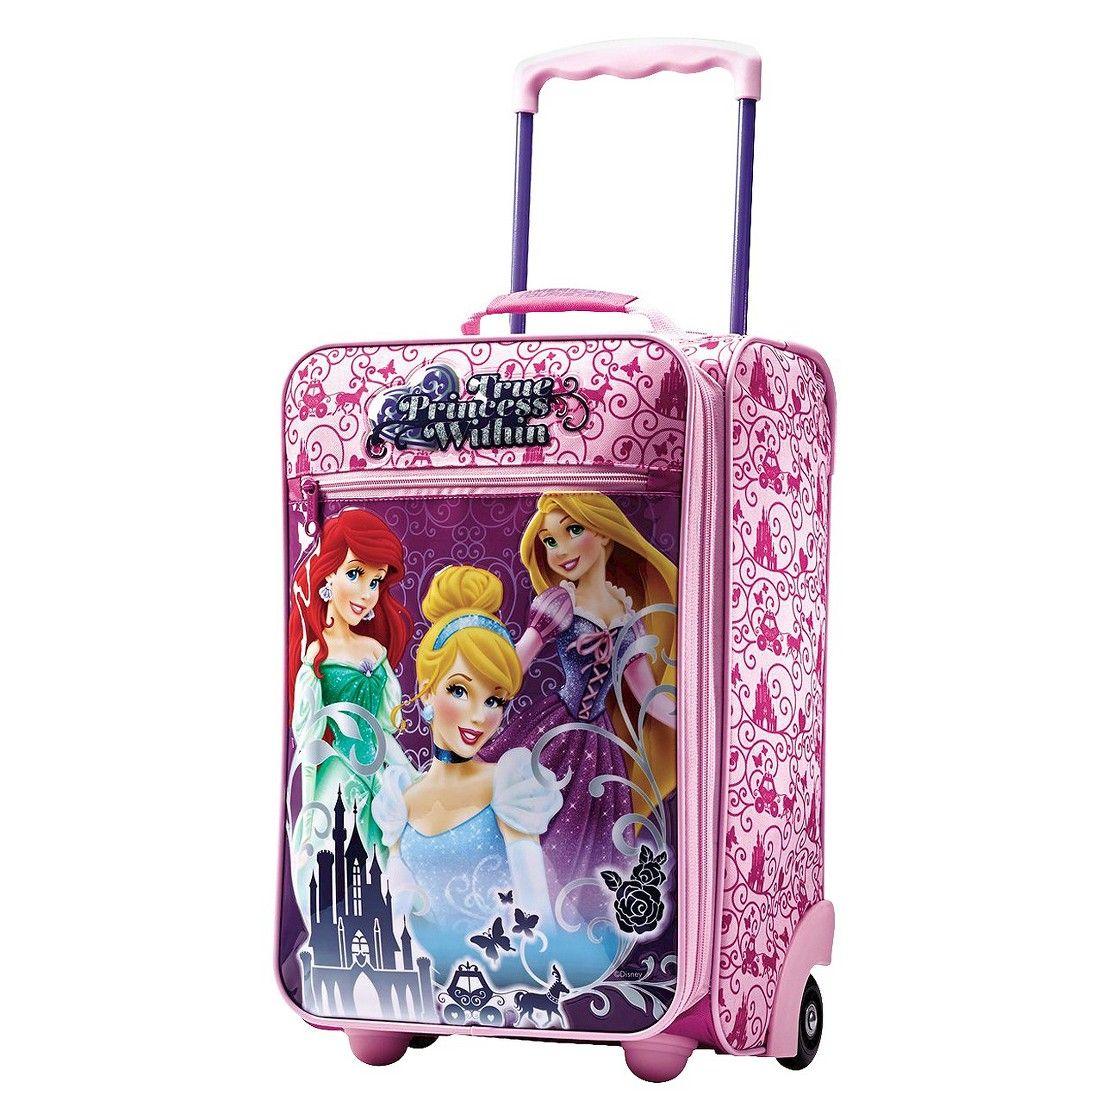 7eef0b54b9f4 American Tourister Disney Princess Suitcase 18